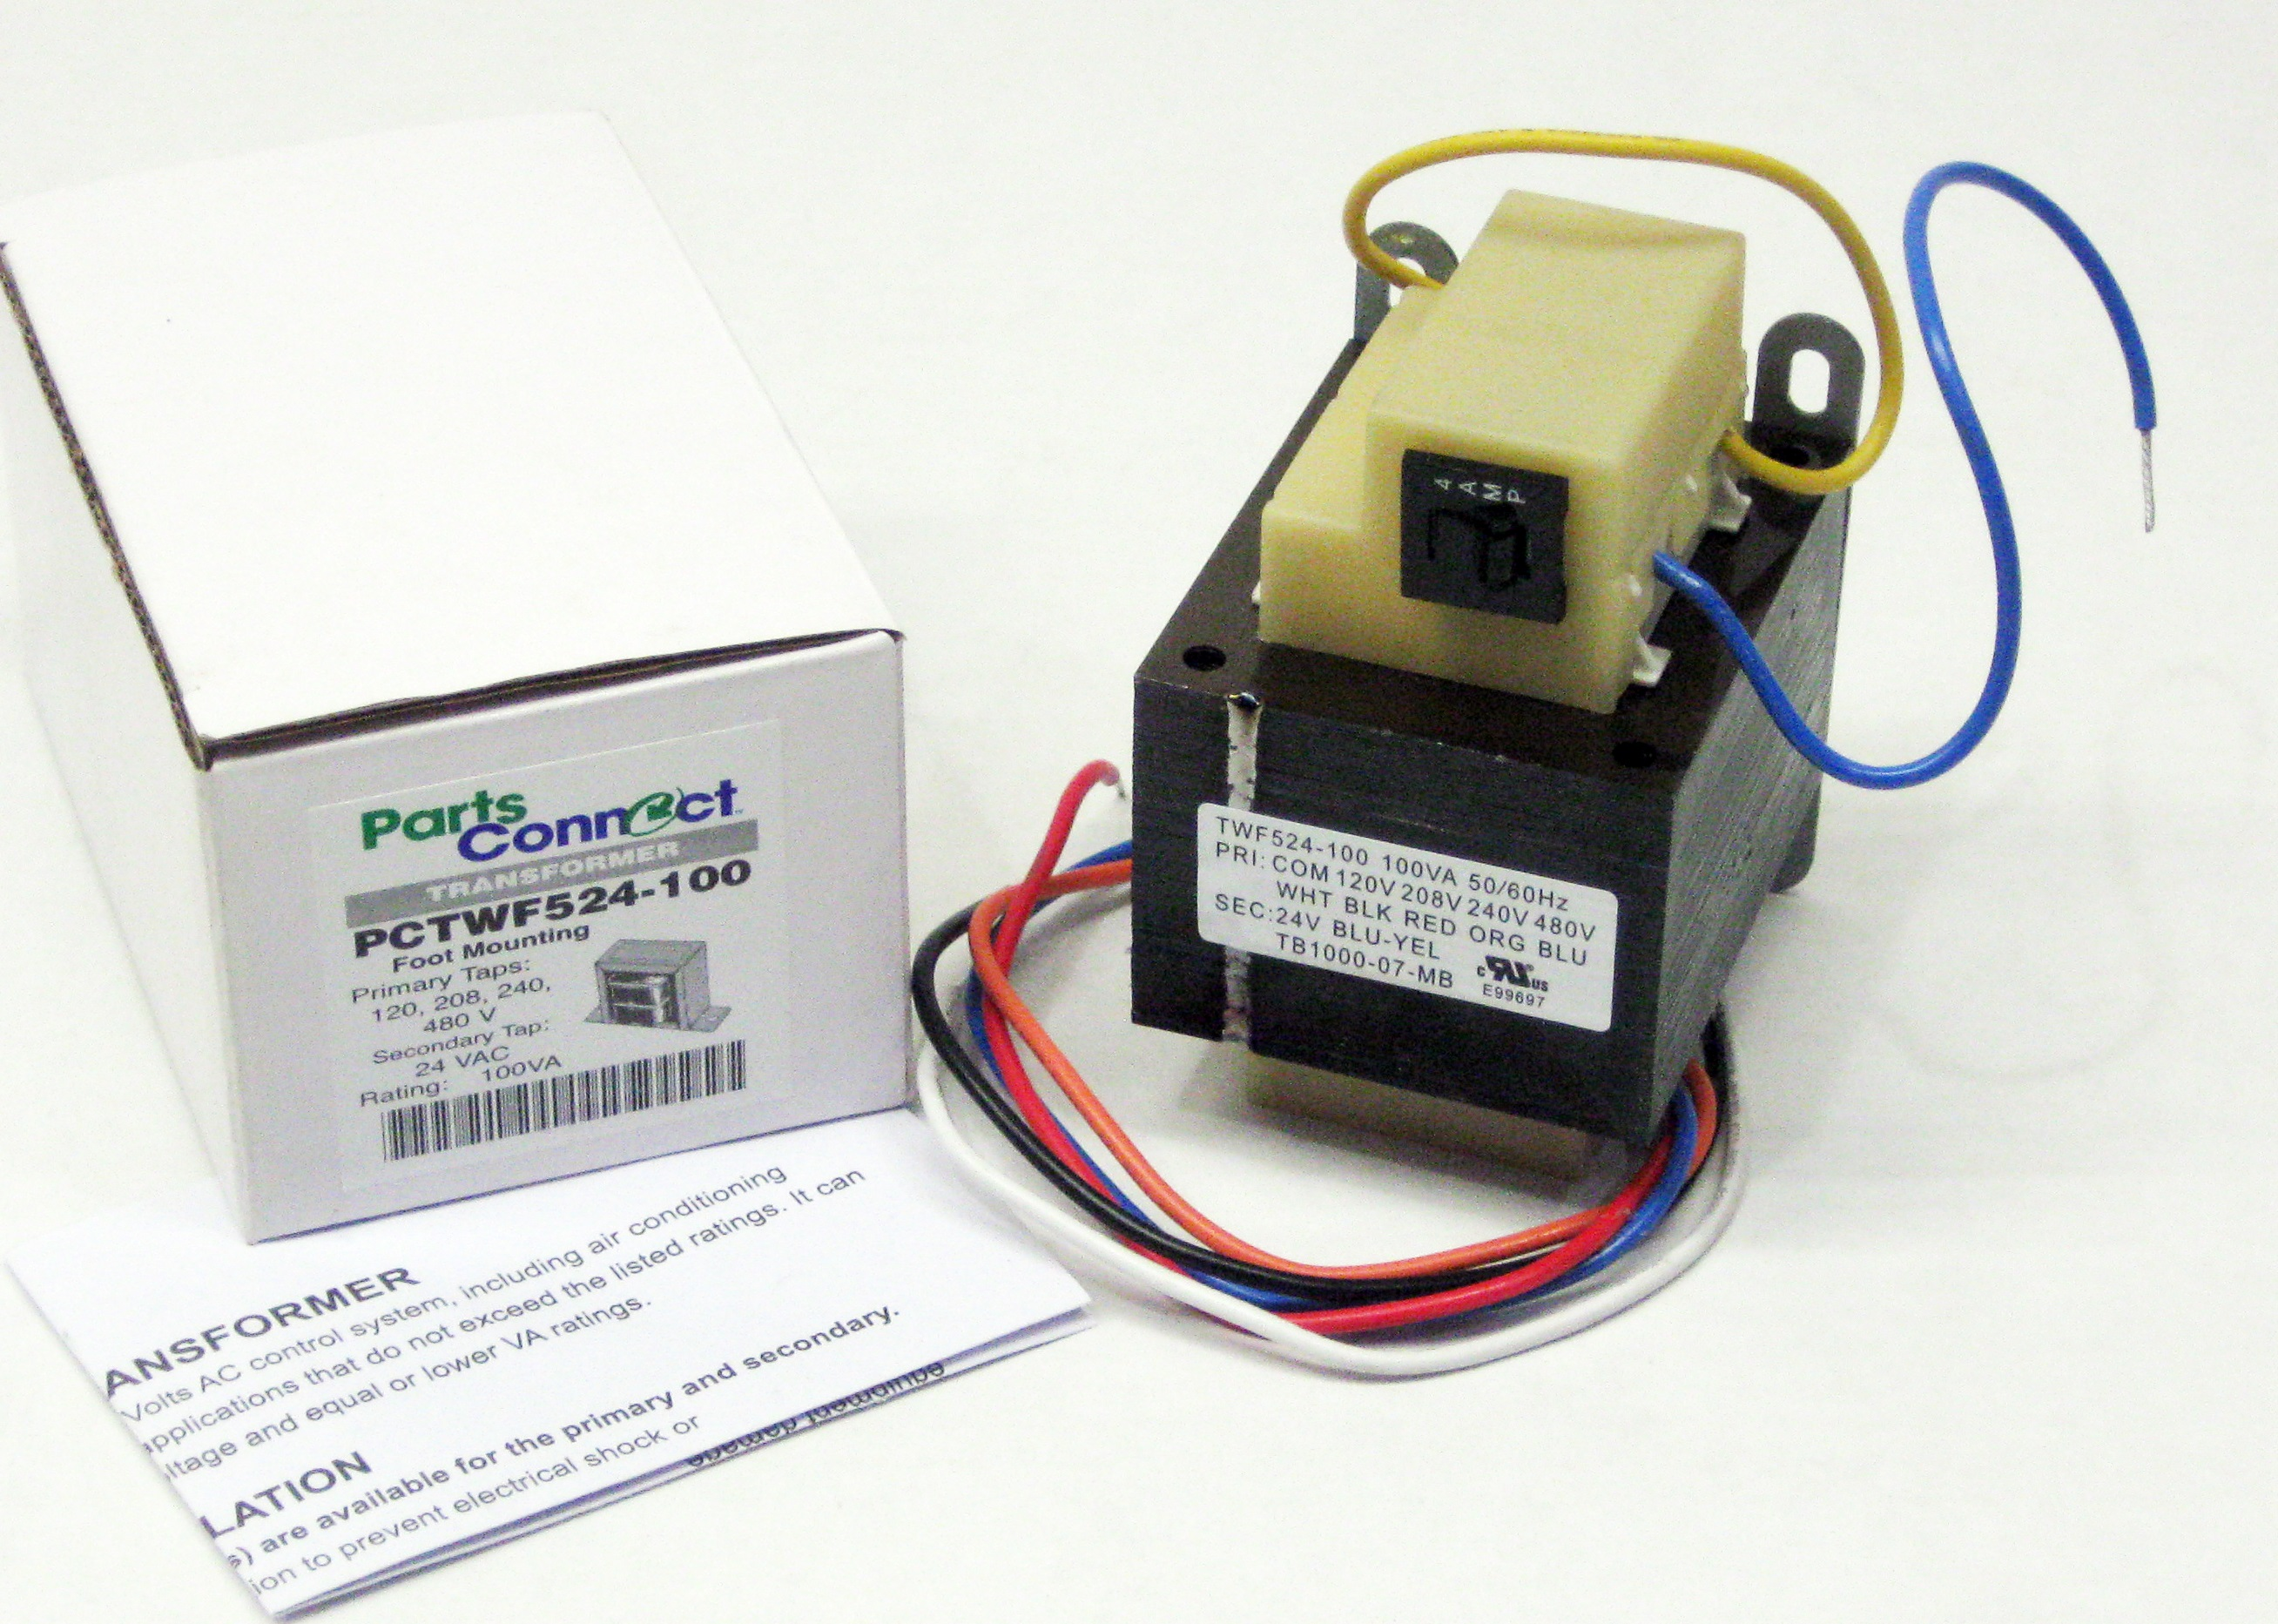 [FPER_4992]  🏆 [DIAGRAM in Pictures Database] Wayne Oil Transformer Wiring Diagram Just  Download or Read Wiring Diagram - DIAGRAM-MEANING.ONYXUM.COM | Wayne Oil Transformer Wiring Diagram |  | Complete Diagram Picture Database - Onyxum.com